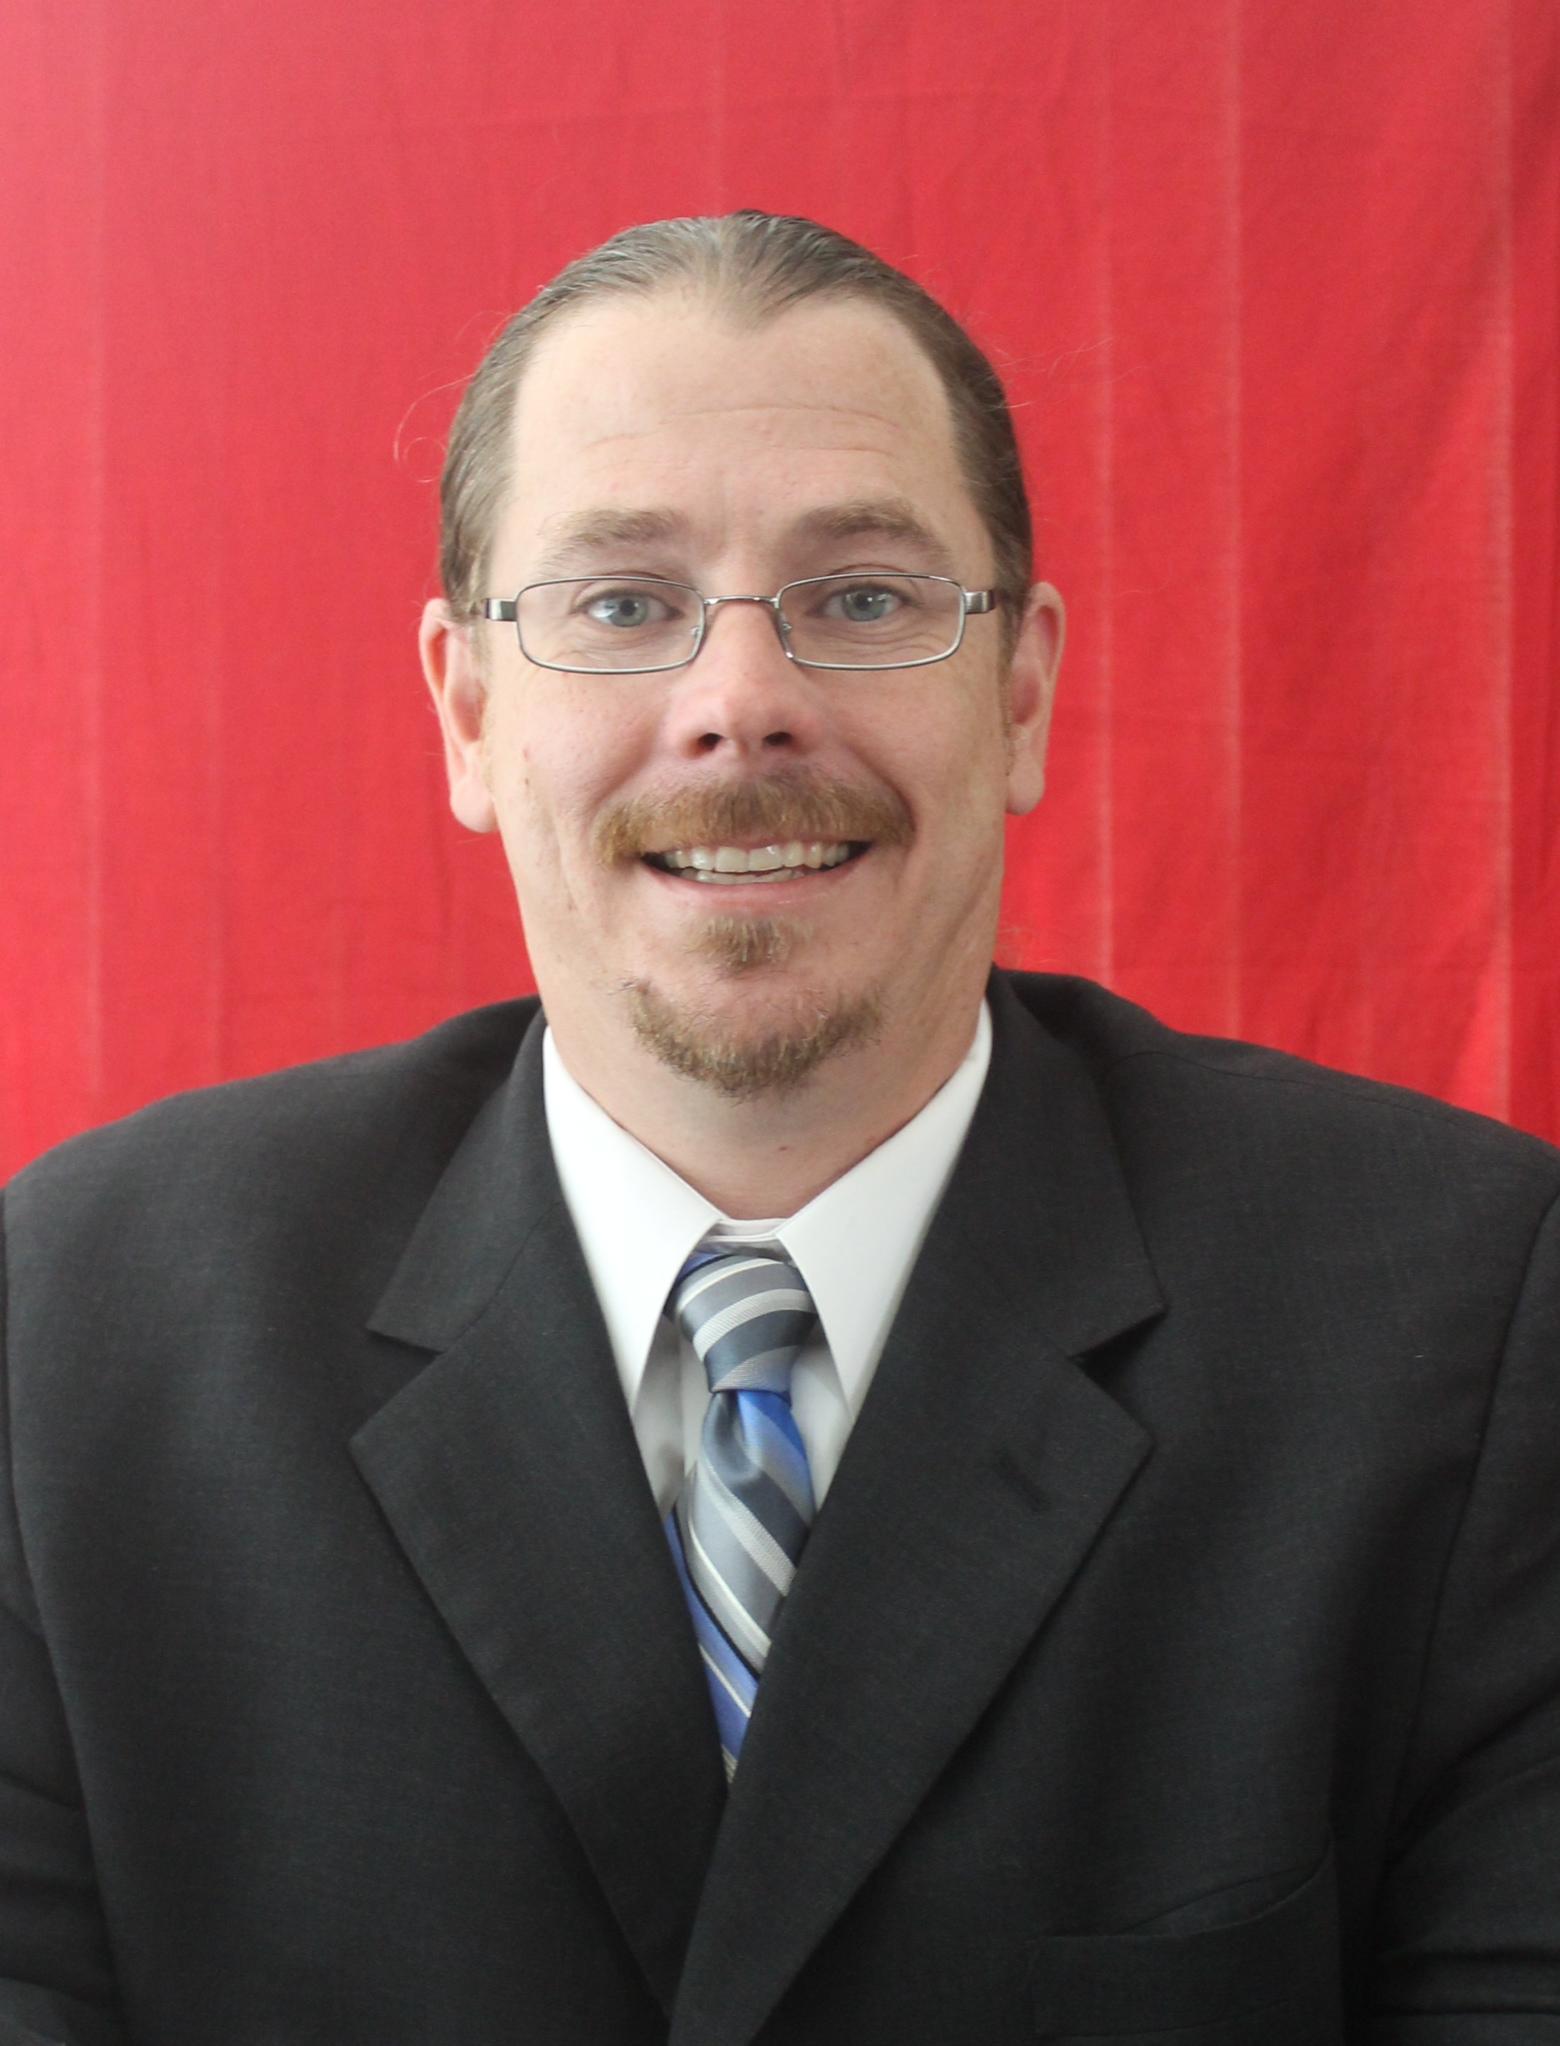 Matt Heath Wins California Republican Regional Vice Chairman